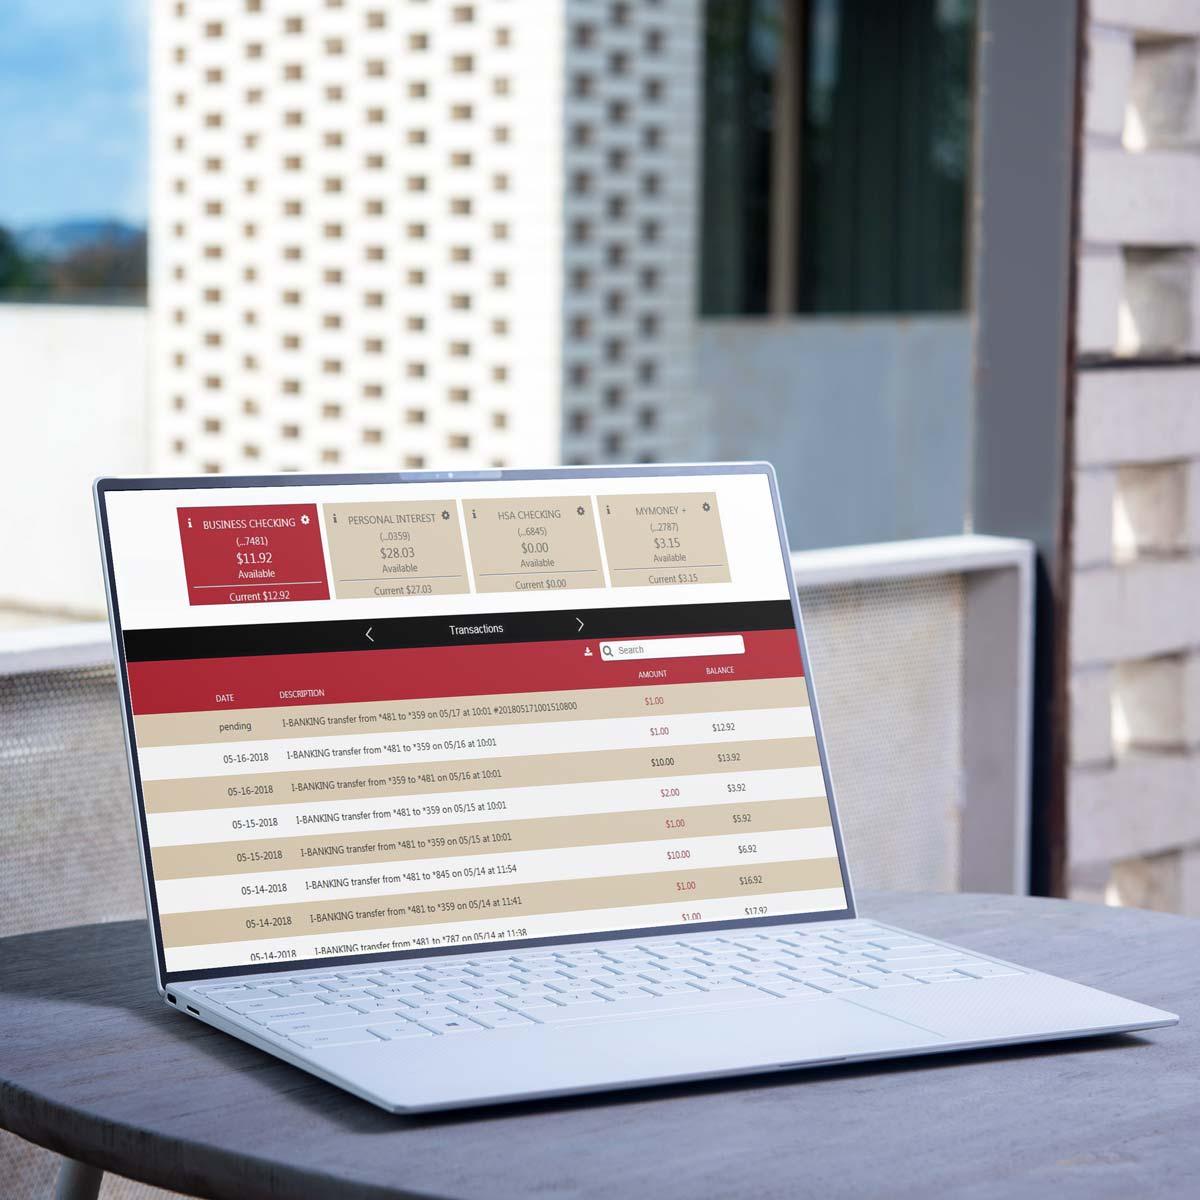 Open Laptop showing Online Banking website